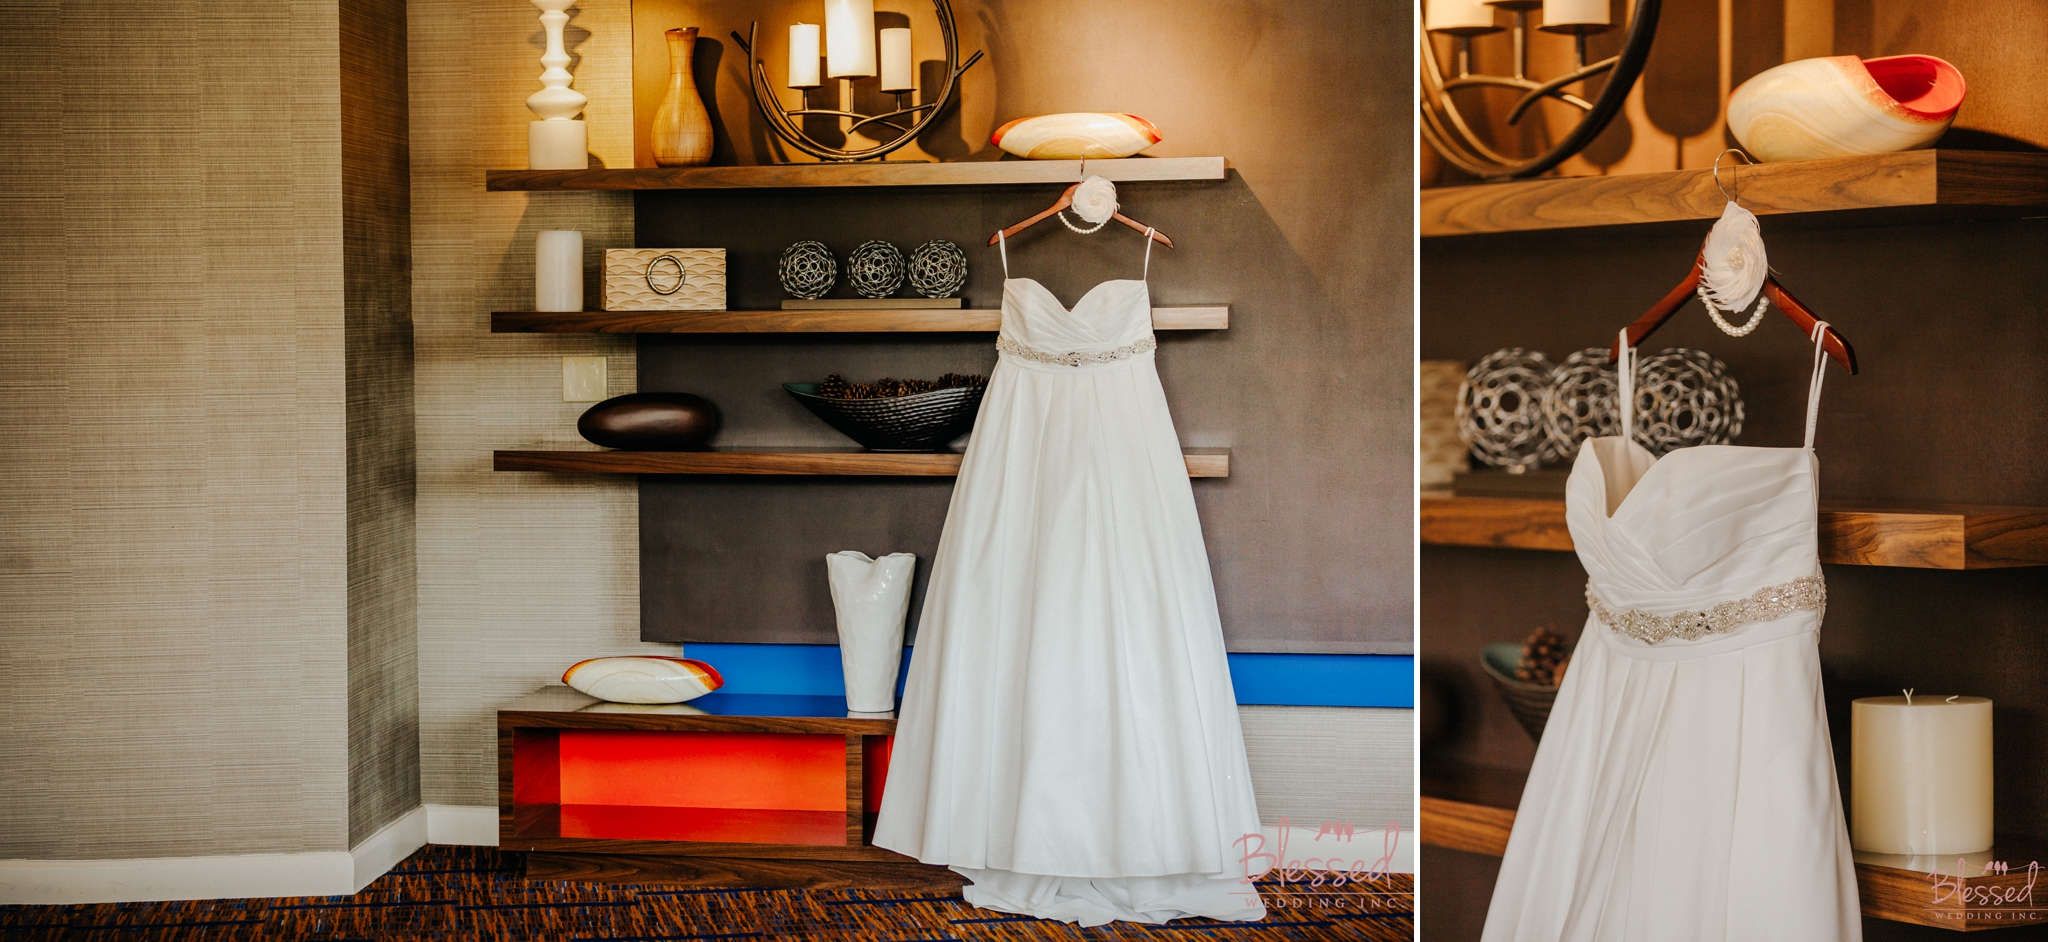 Orfila Vinery Wedding by Blessed Wedding Photography 1.jpg